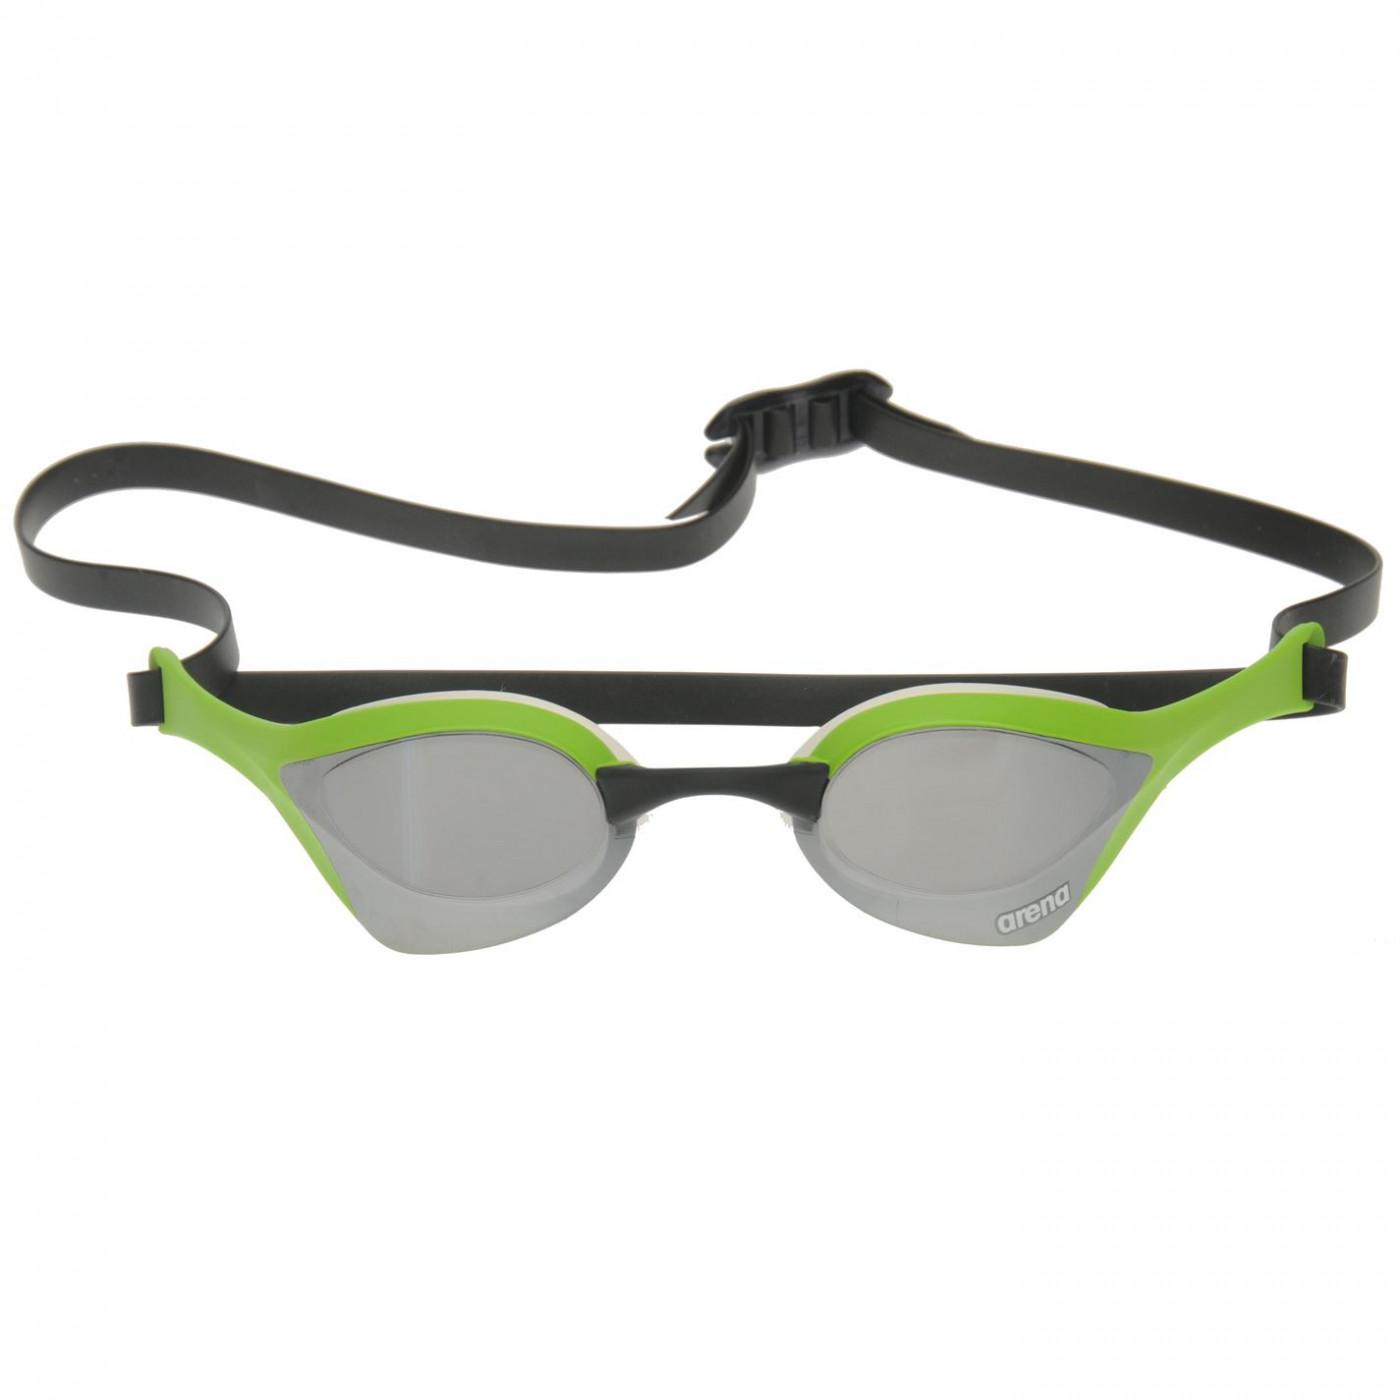 Cobra Ultra Mirror.Arena Cobra Ultra Mirror Racing Goggles Factcool